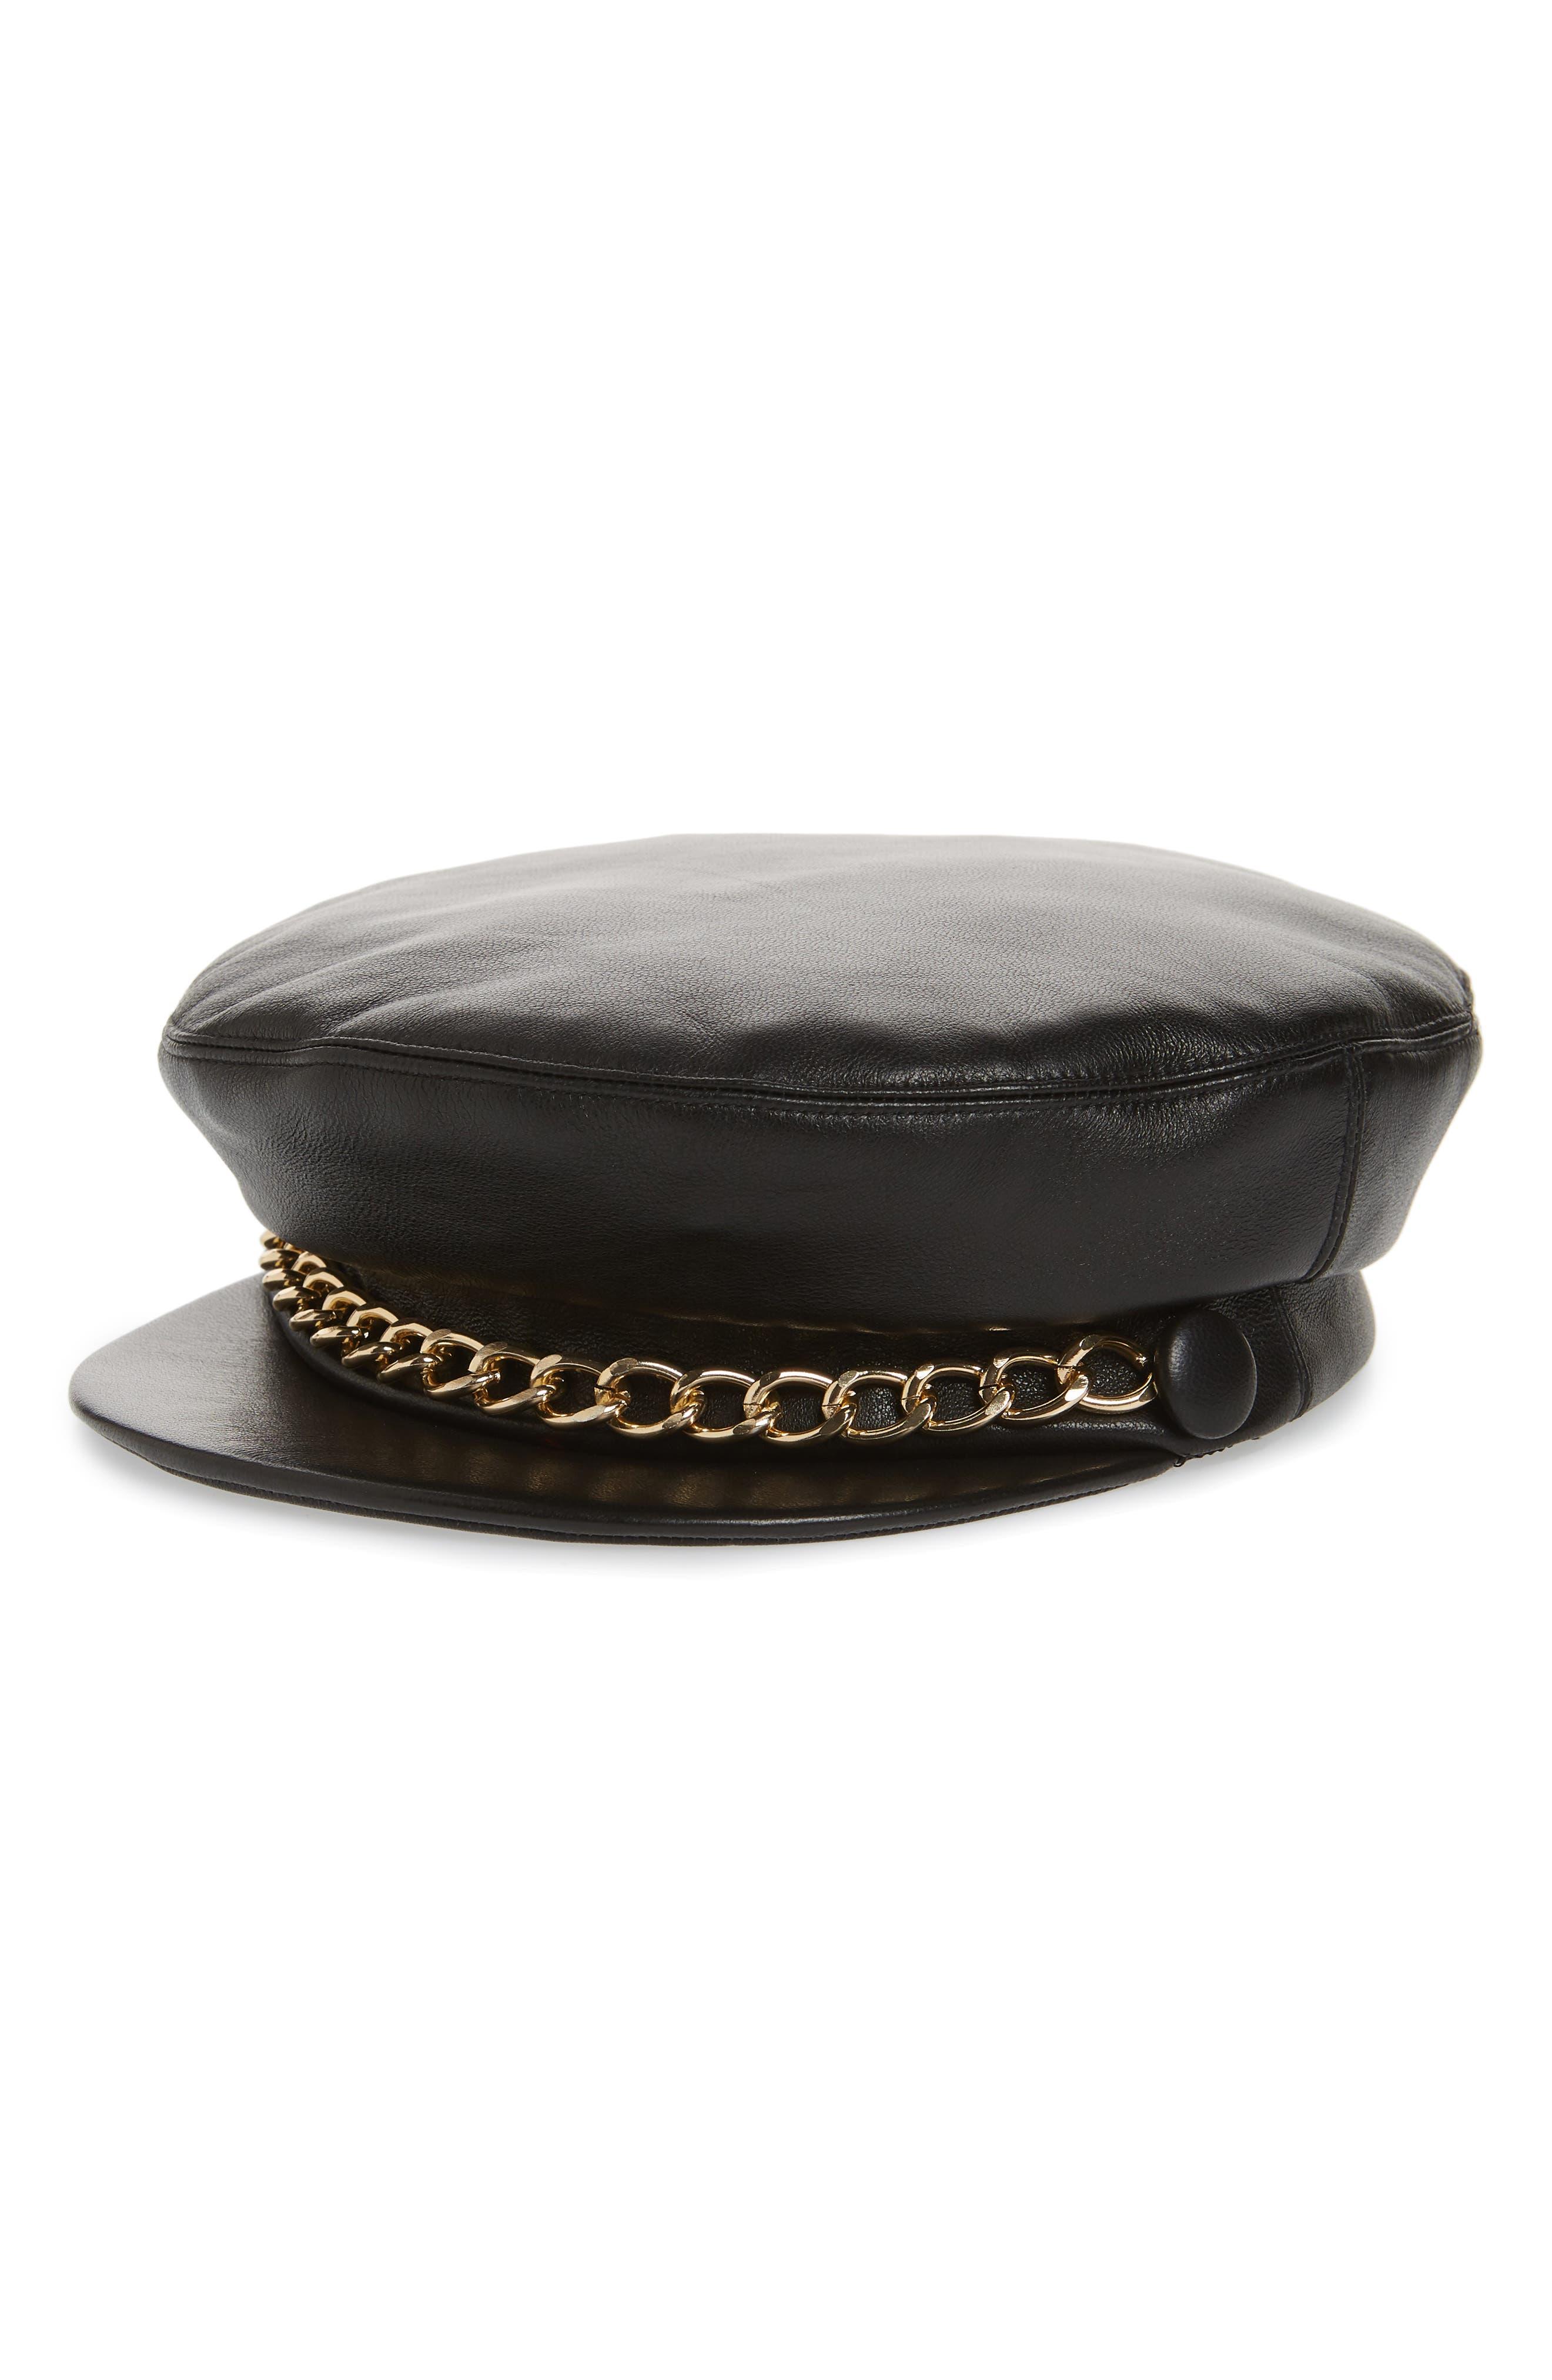 Marina Leather Baker Boy Cap,                         Main,                         color, BLACK